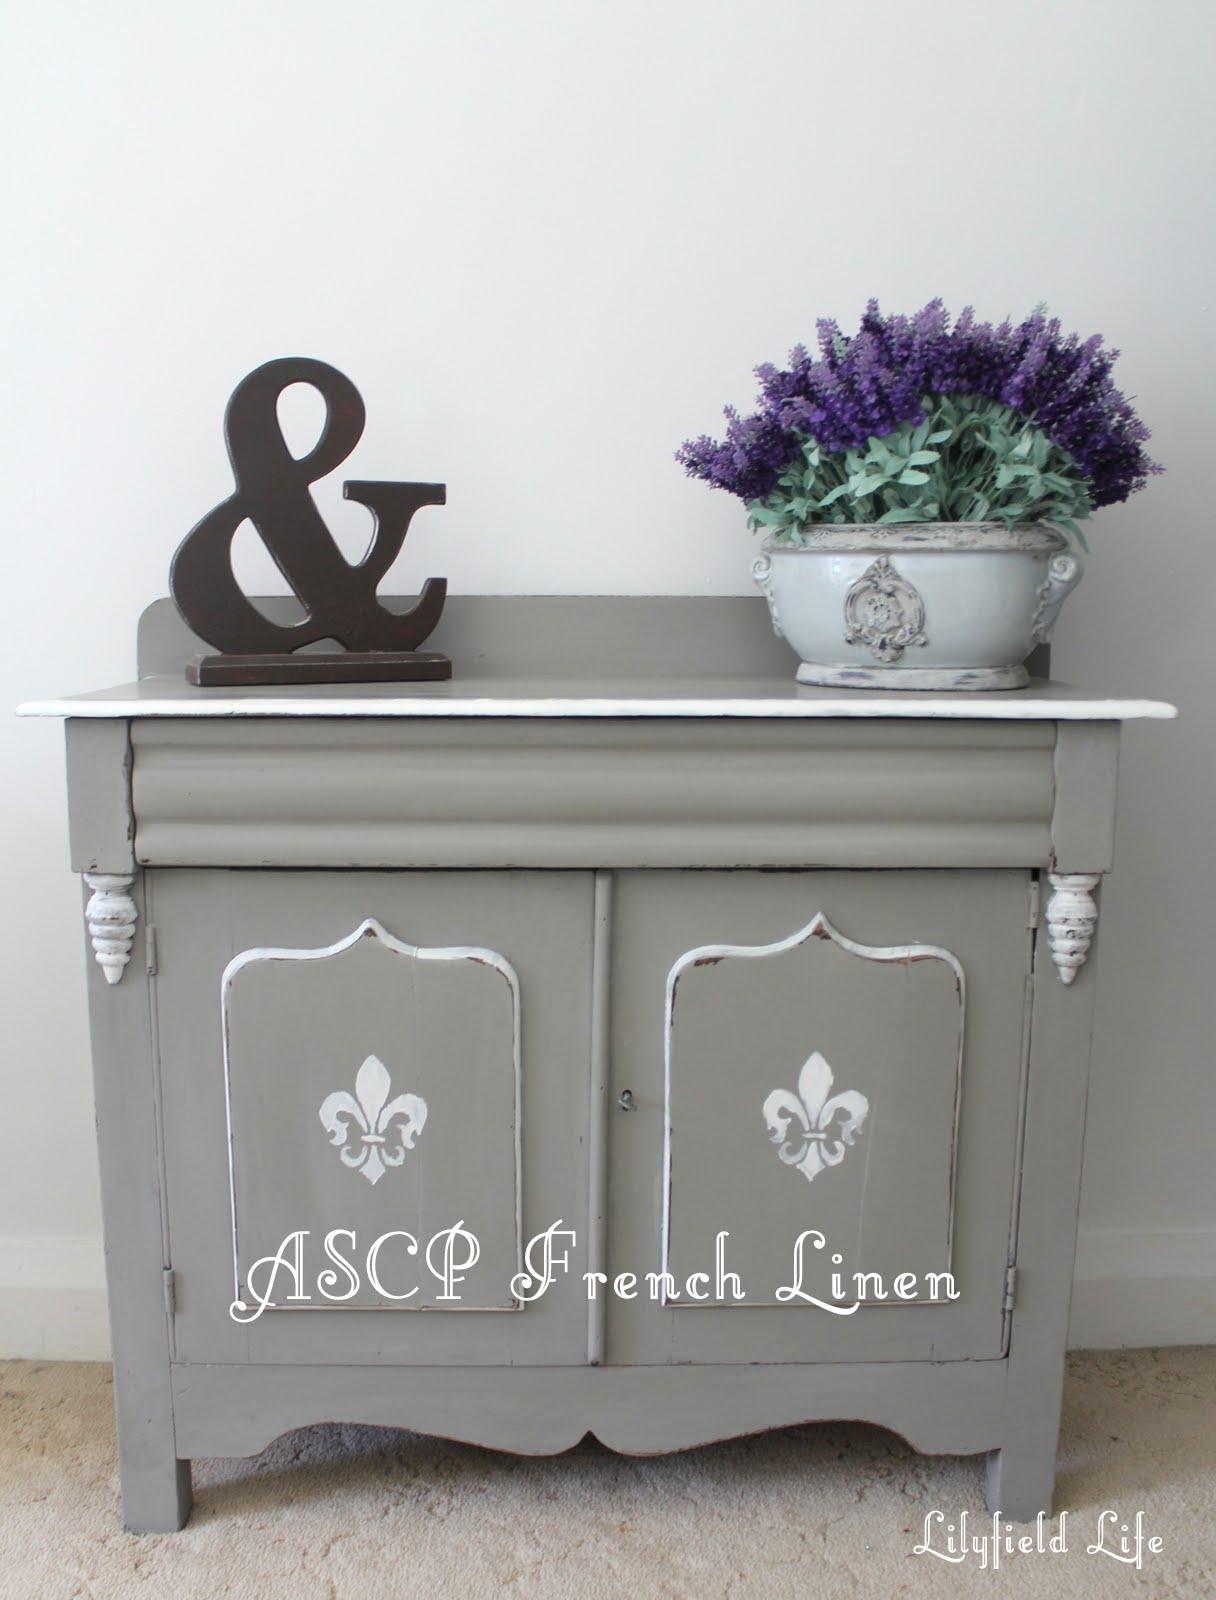 lilyfield life mix tint colour annie sloan chalk paint. Black Bedroom Furniture Sets. Home Design Ideas